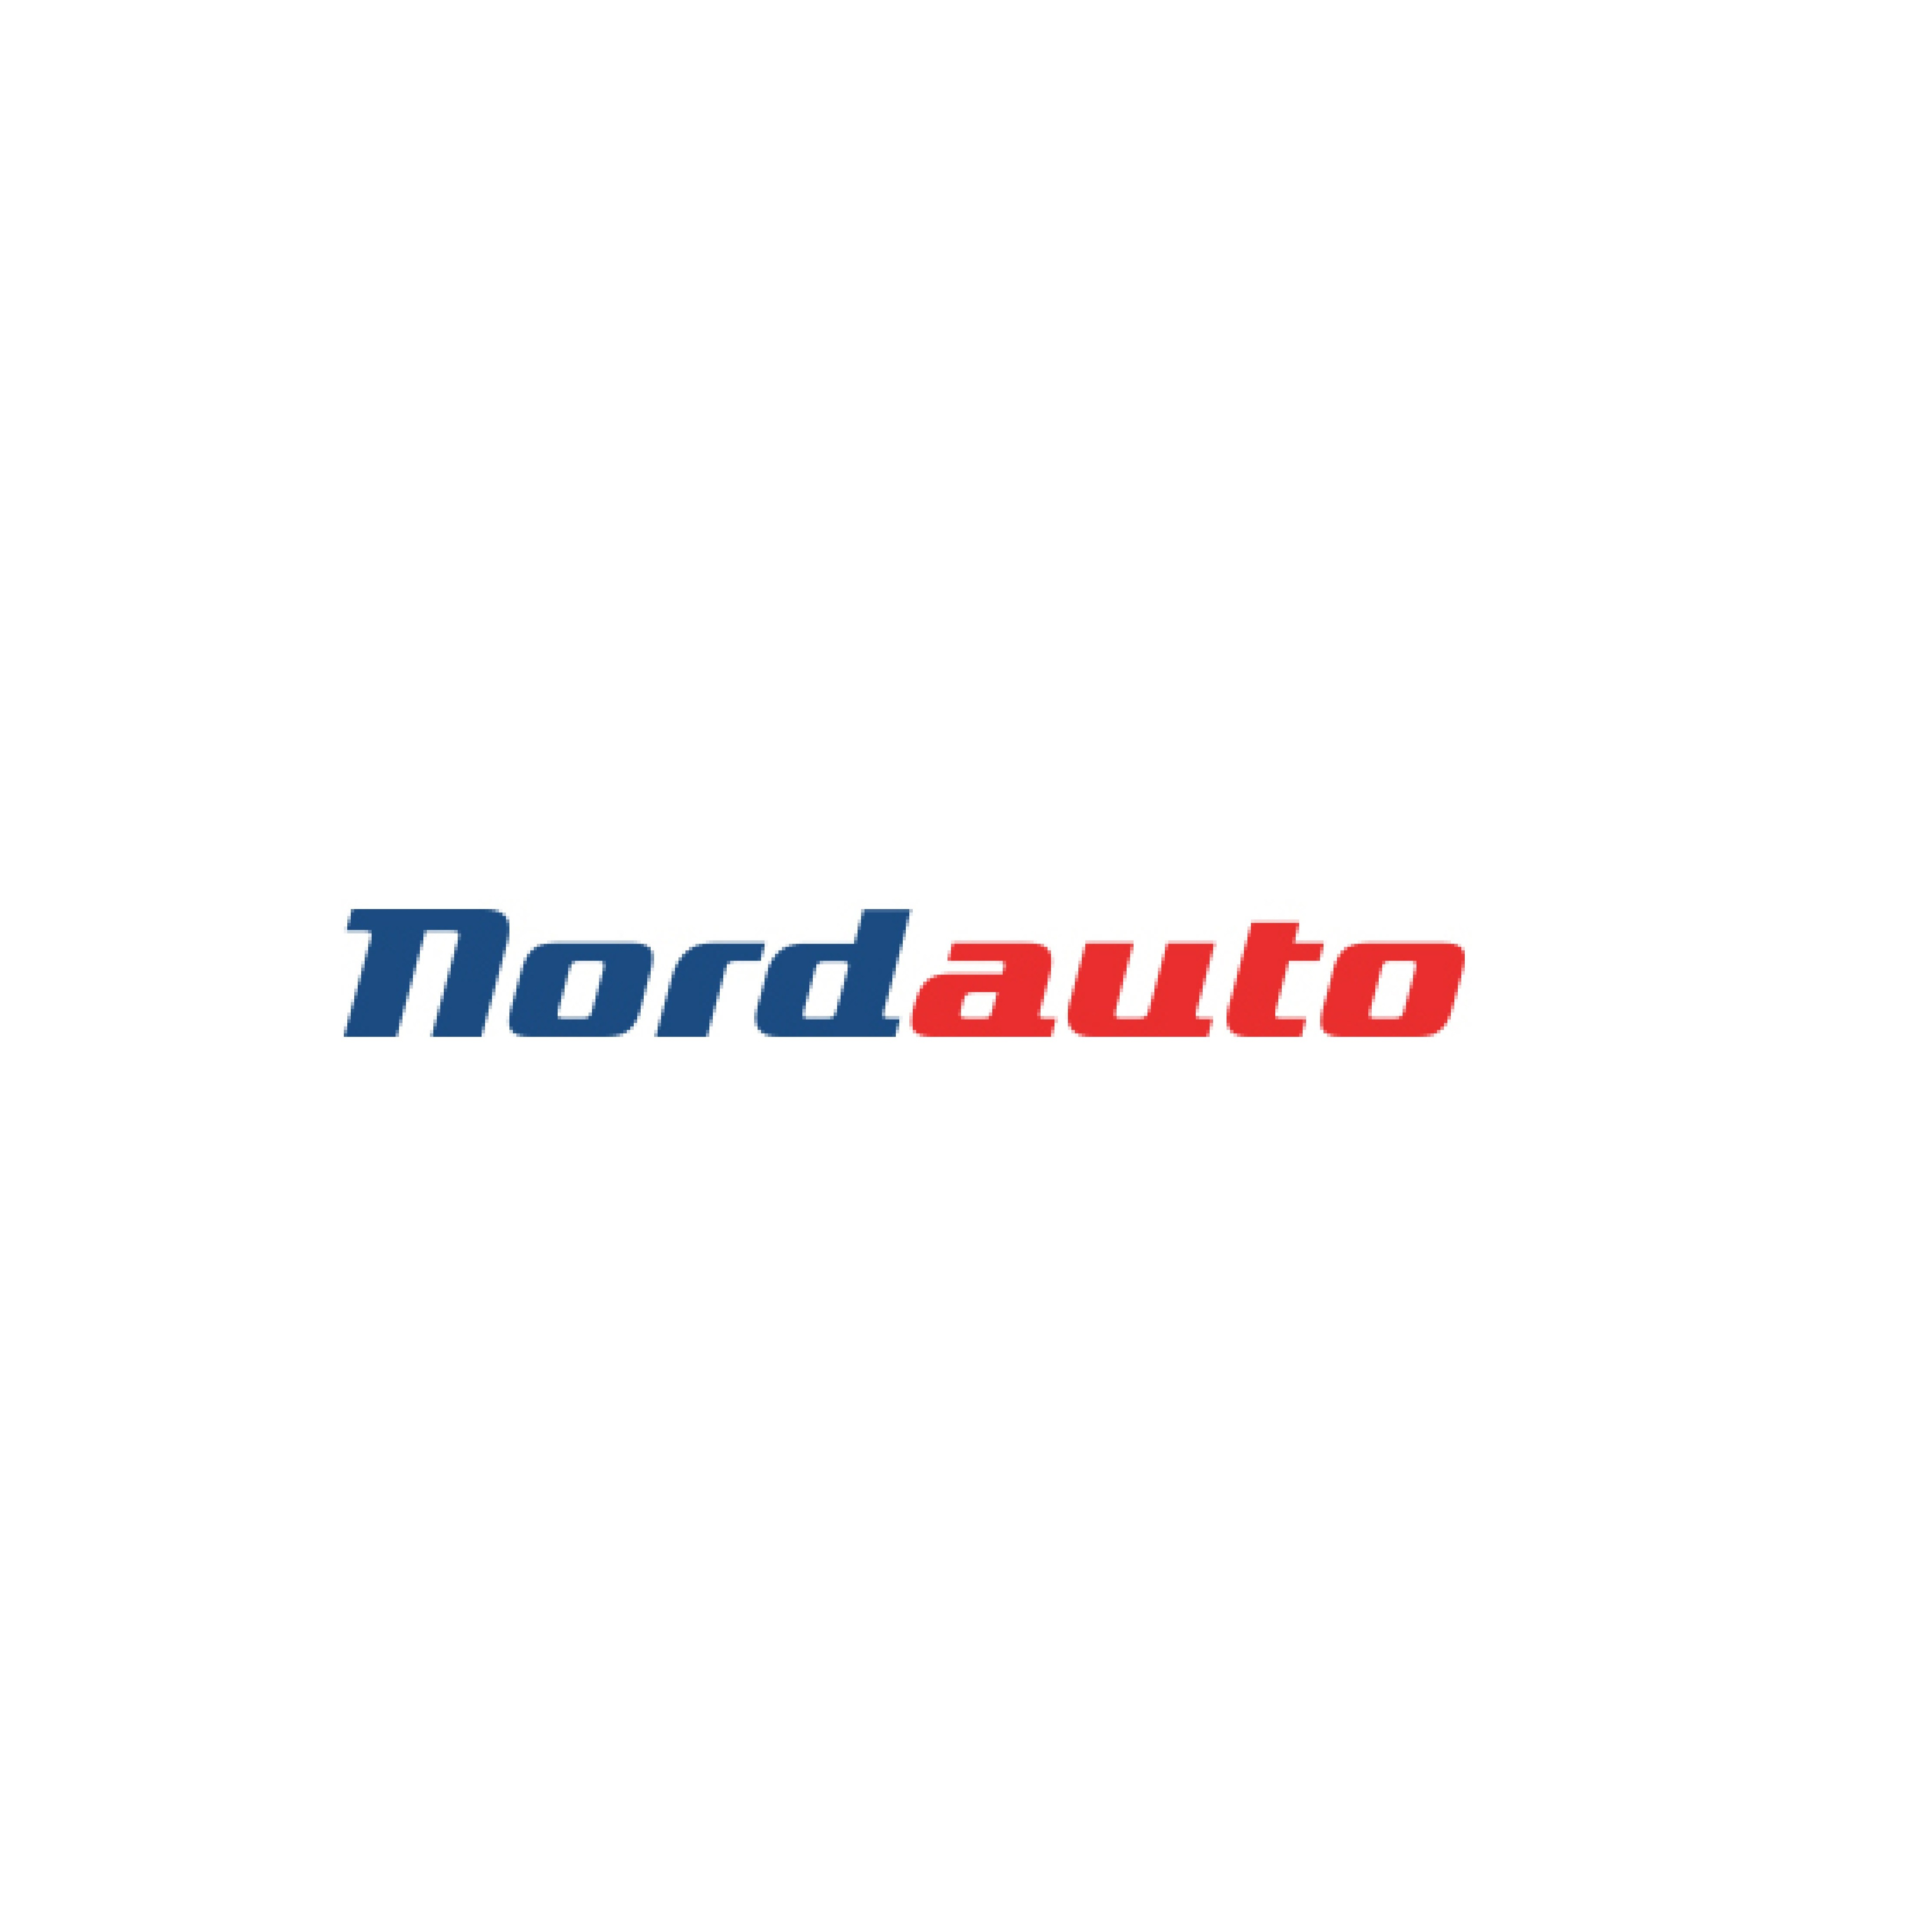 Nordauto (Nordauto Grupp OÜ)